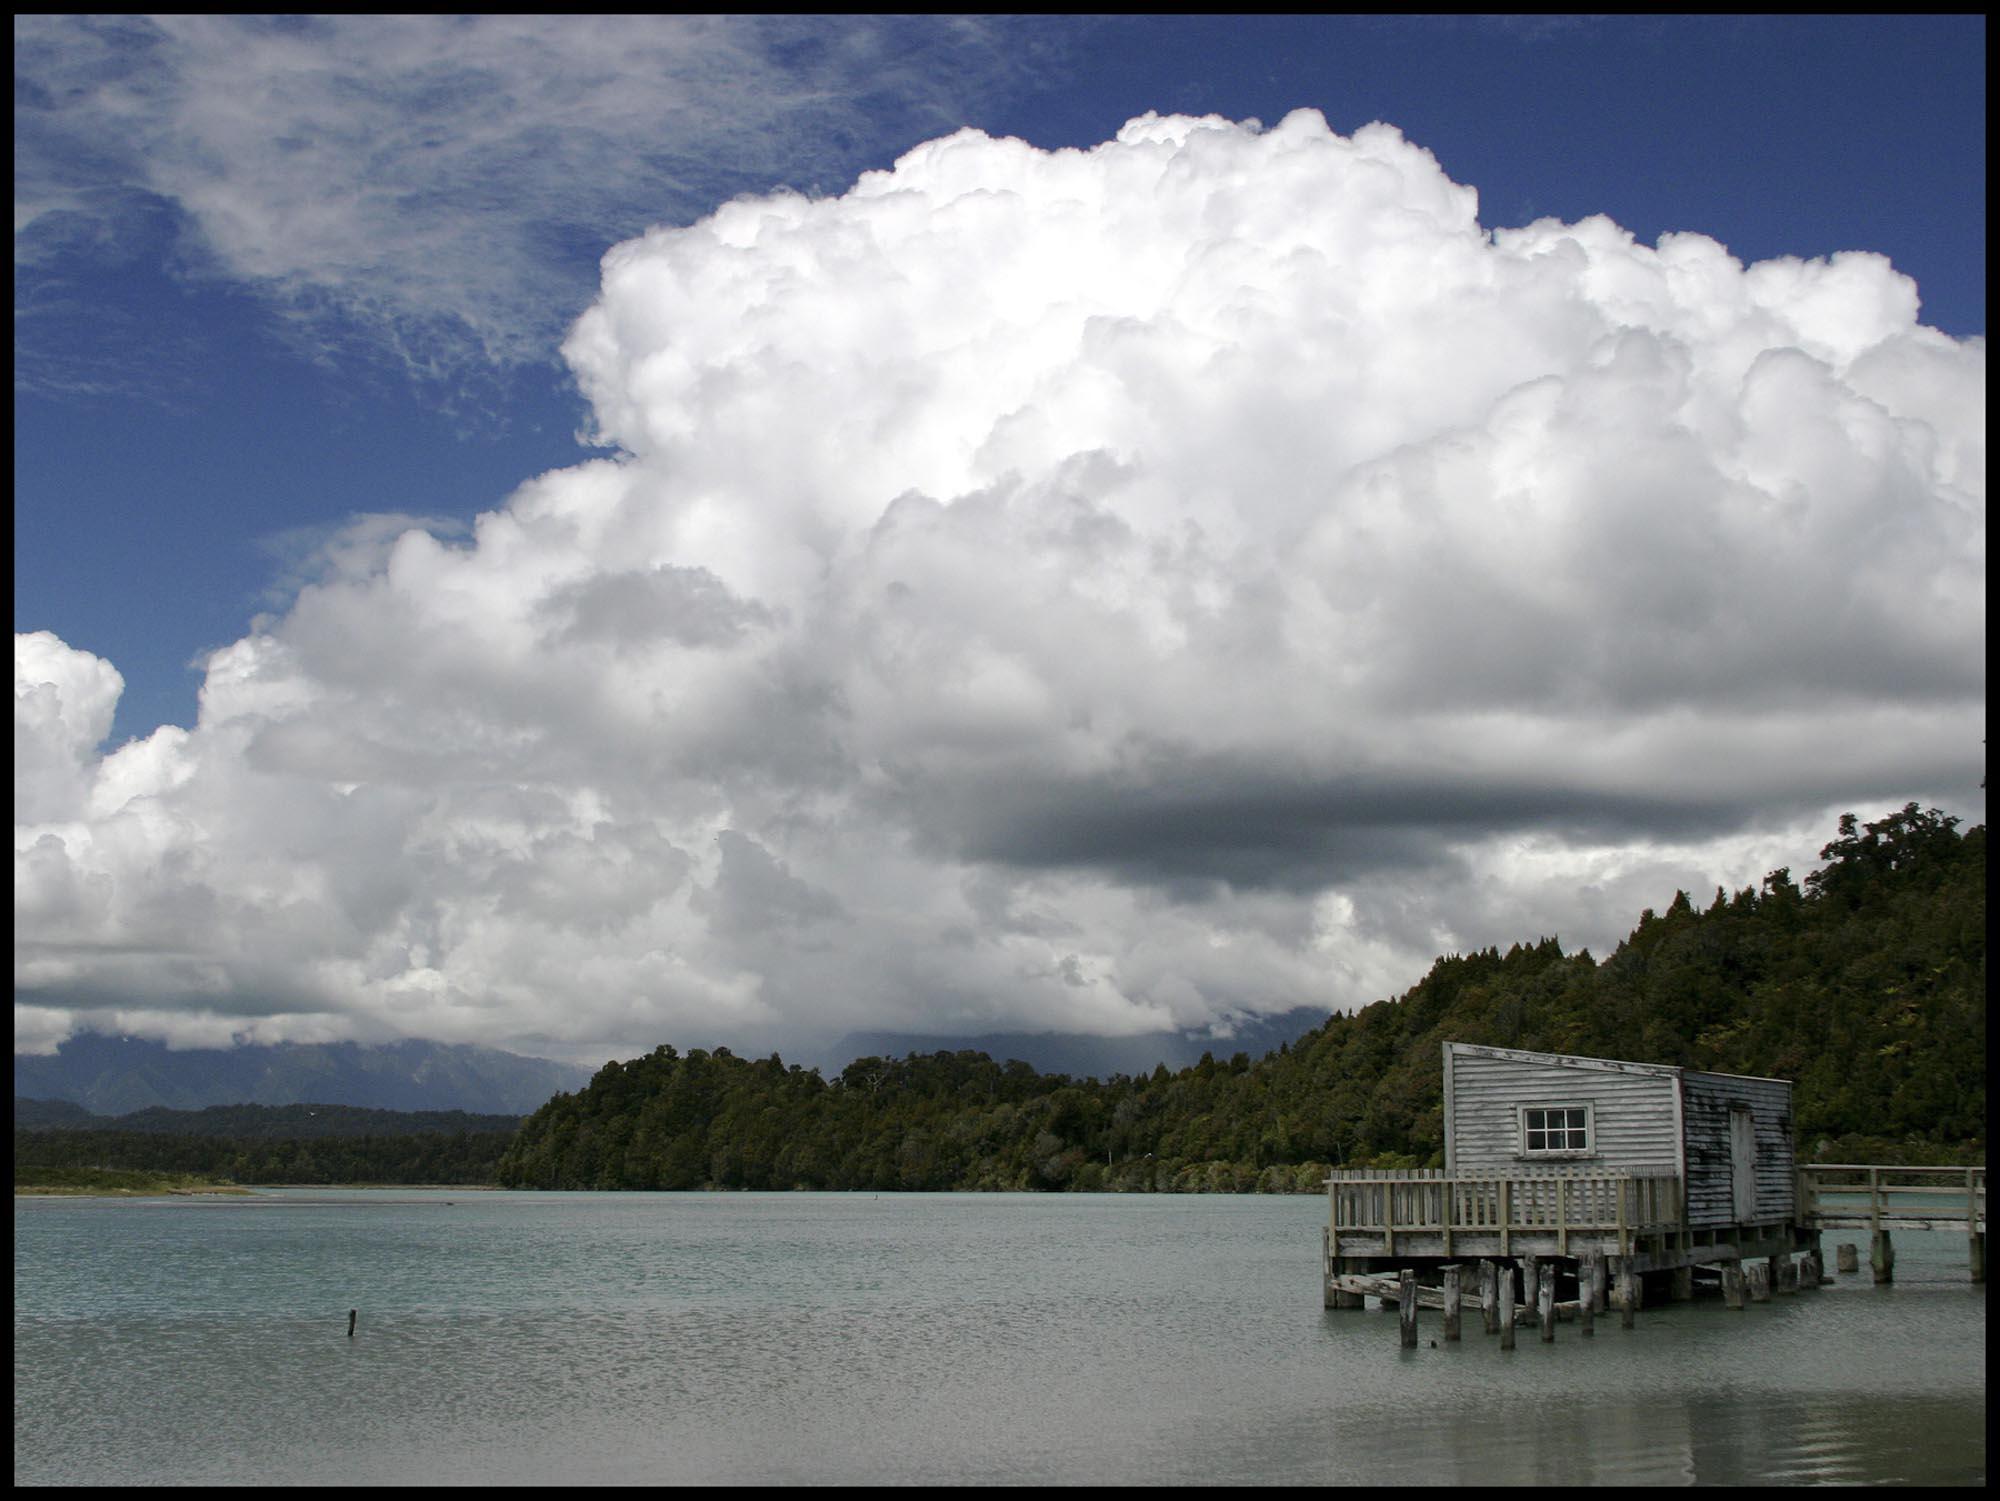 Boathouse-Clouds.jpg